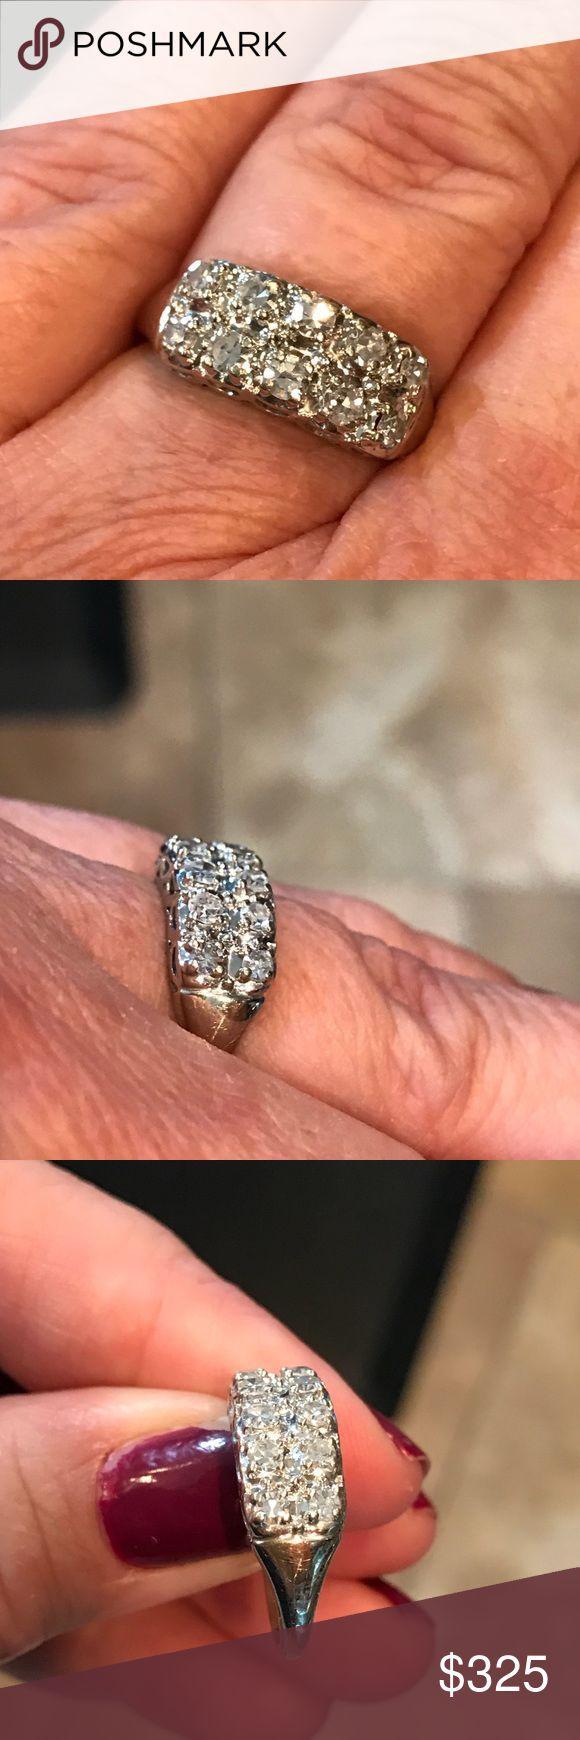 14 karat white gold antique diamond ring Beautiful and sparkly vintage diamond ring. 1/3 karat genuine diamonds. Stamped 14 K.  Size 5.75 Jewelry Rings